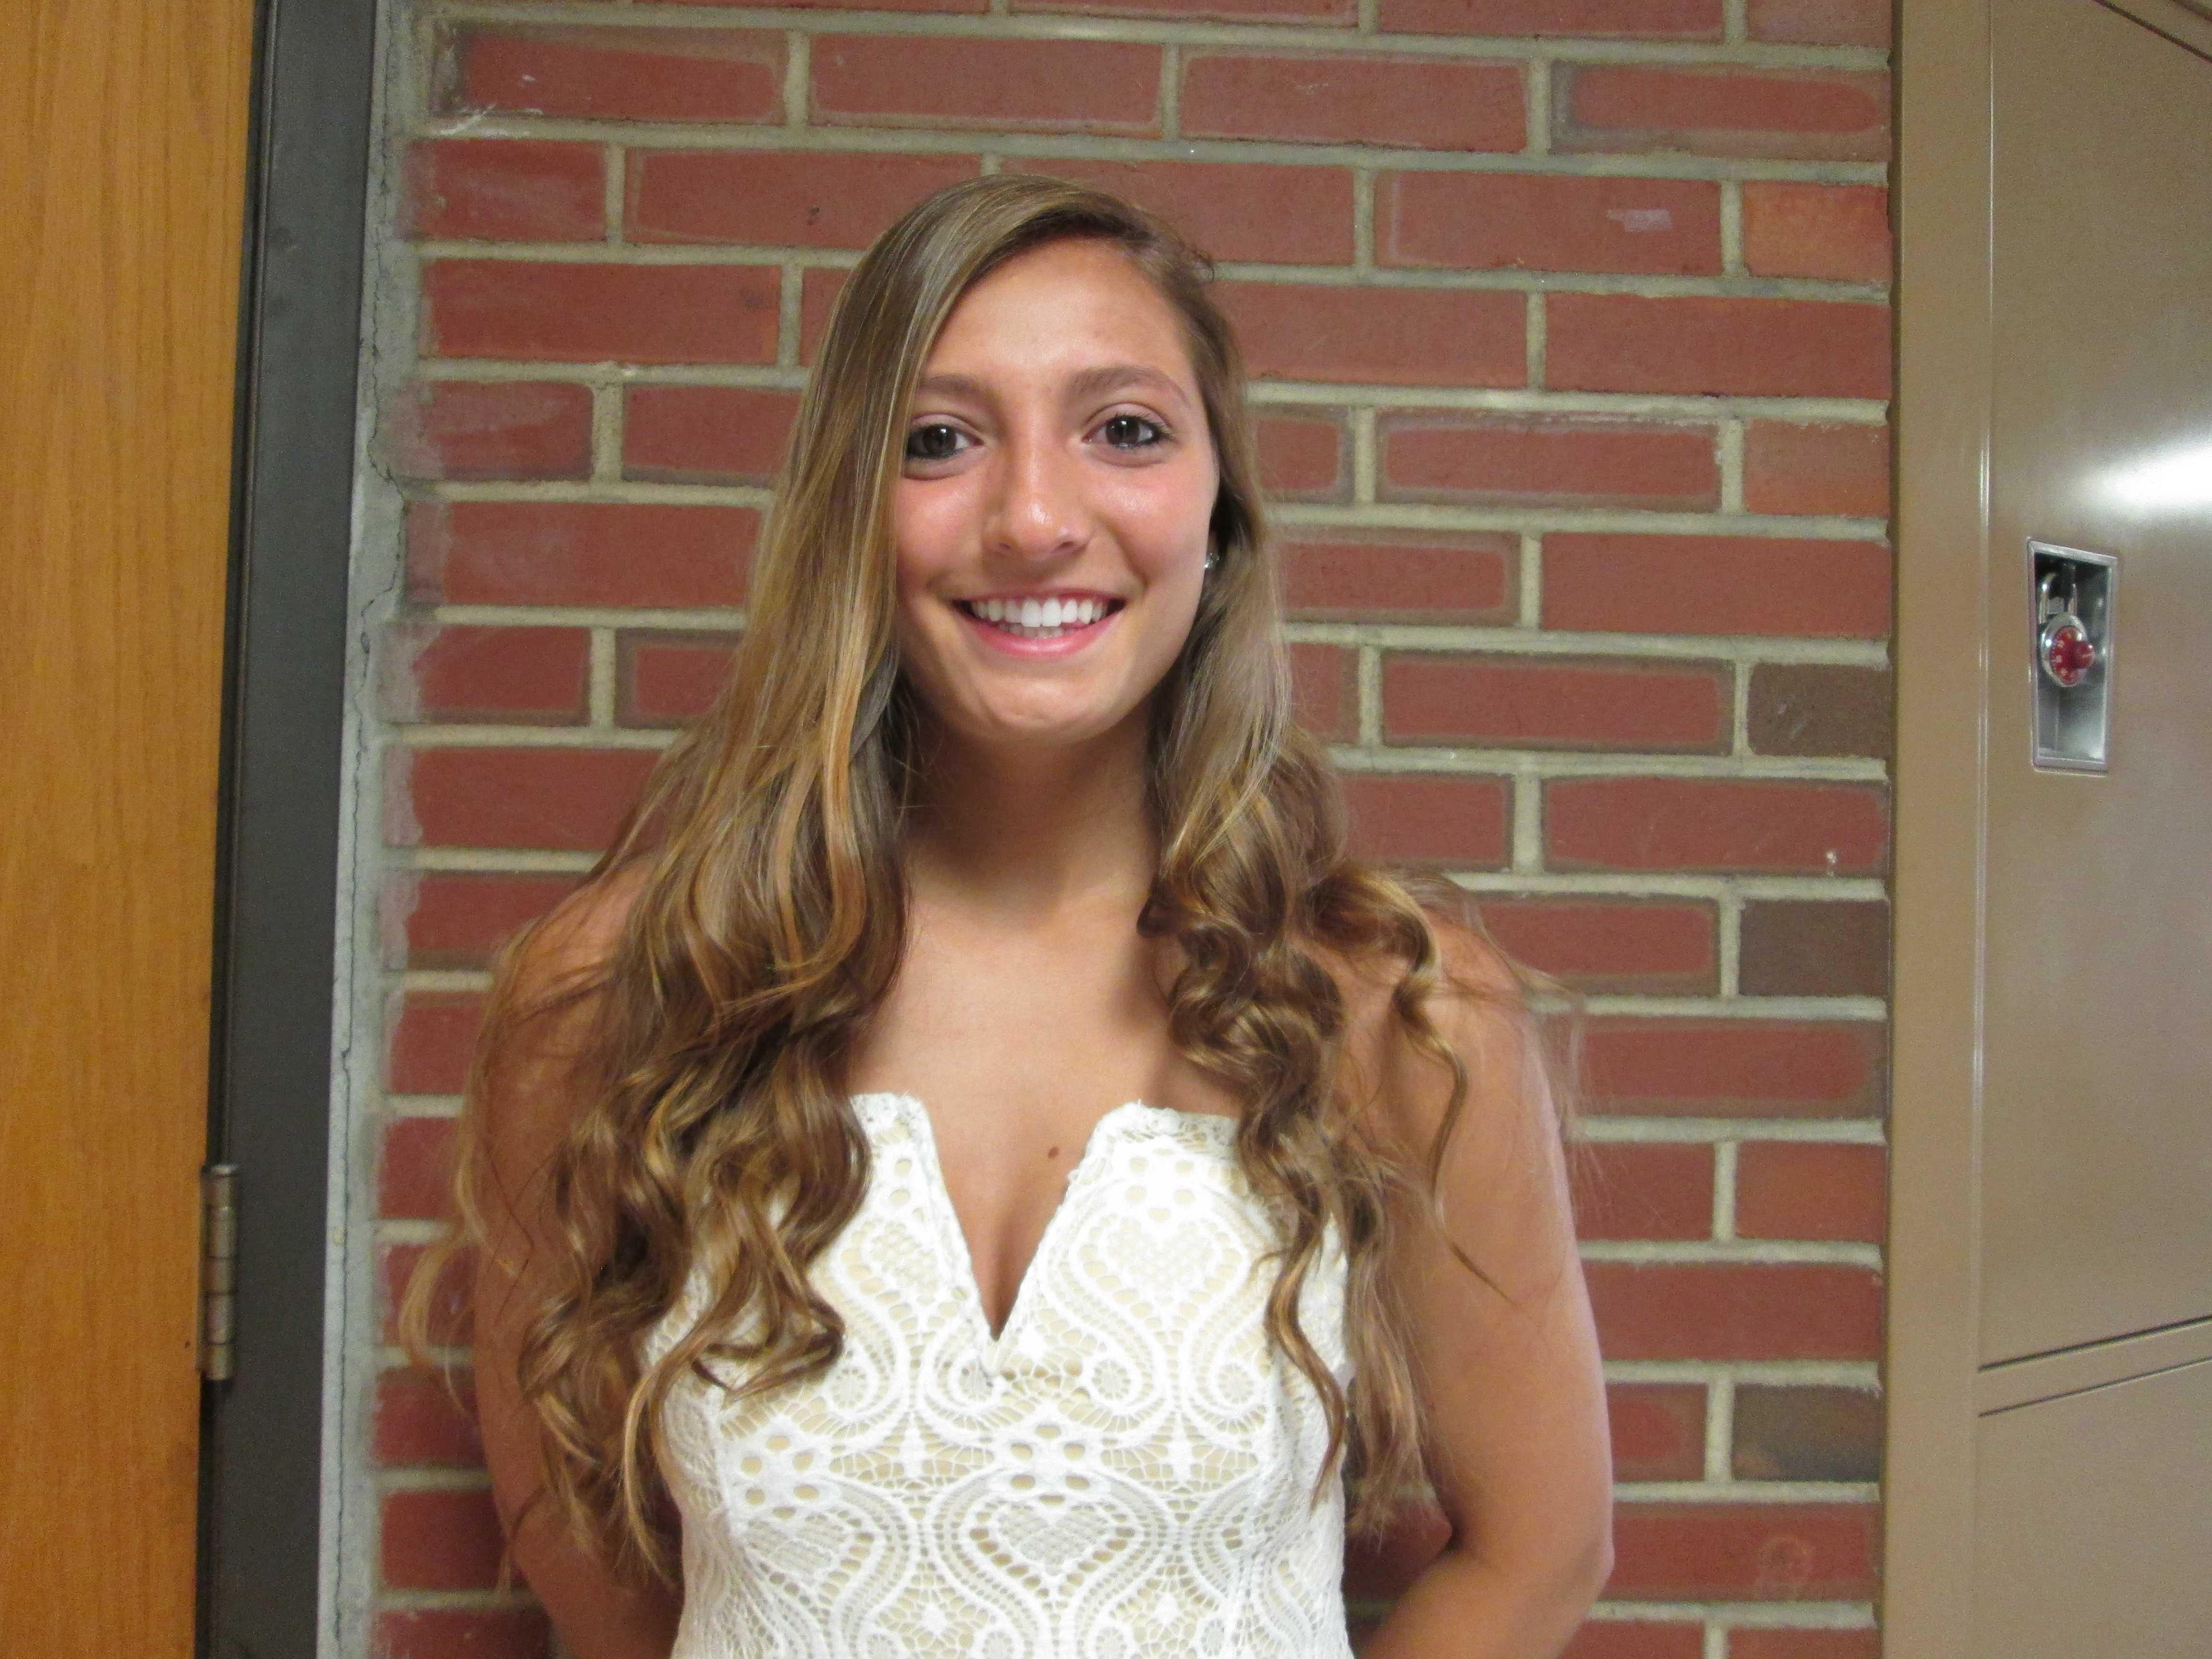 Julia Hornyak - attending Eastern Connecticut State University - Undeclared